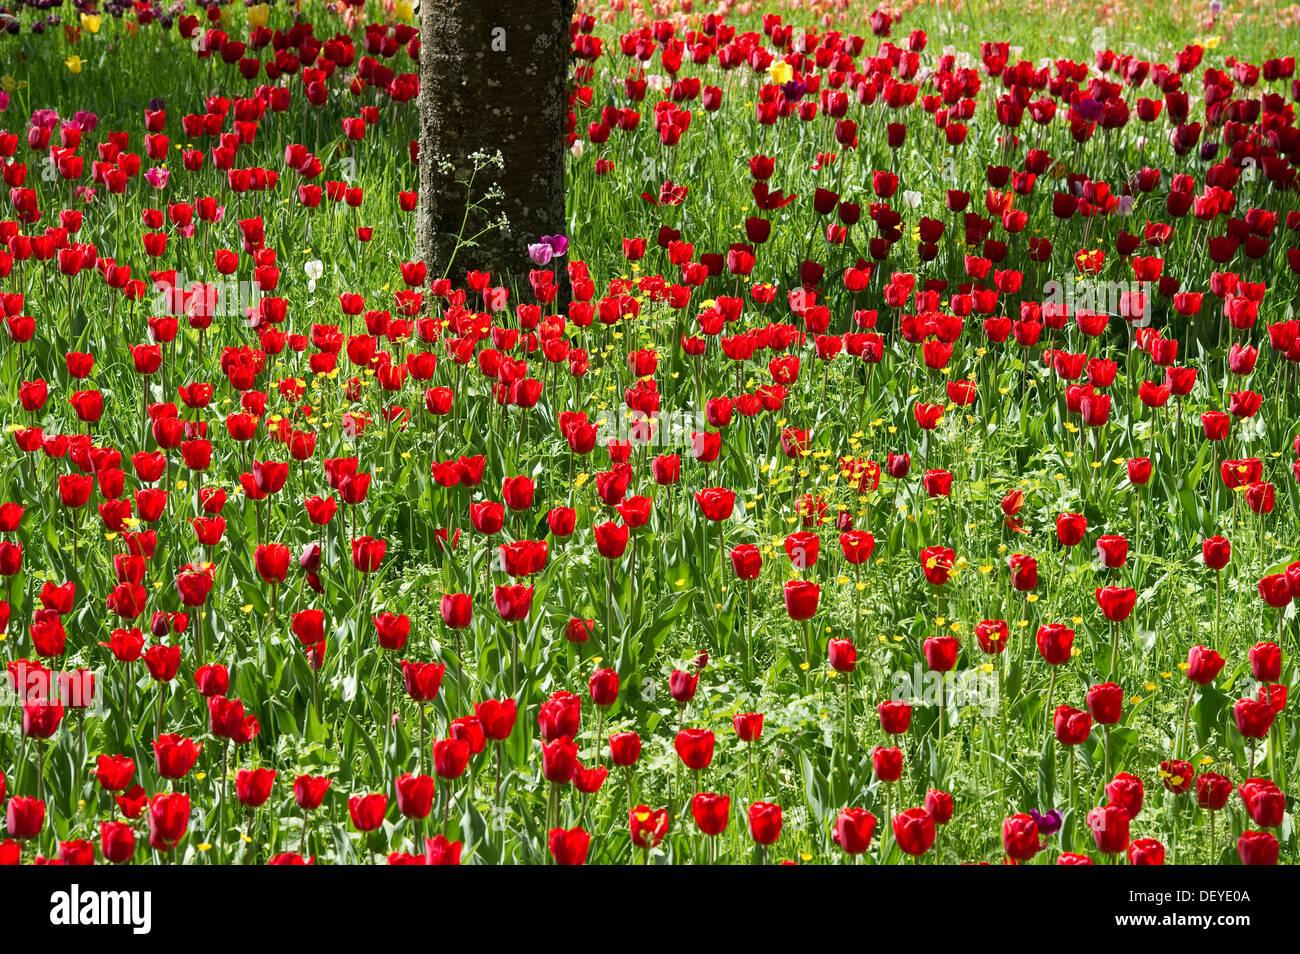 Red tulips, tulip field, Insel Mainau, Konstanz, Baden-Württemberg, Germany - Stock Image